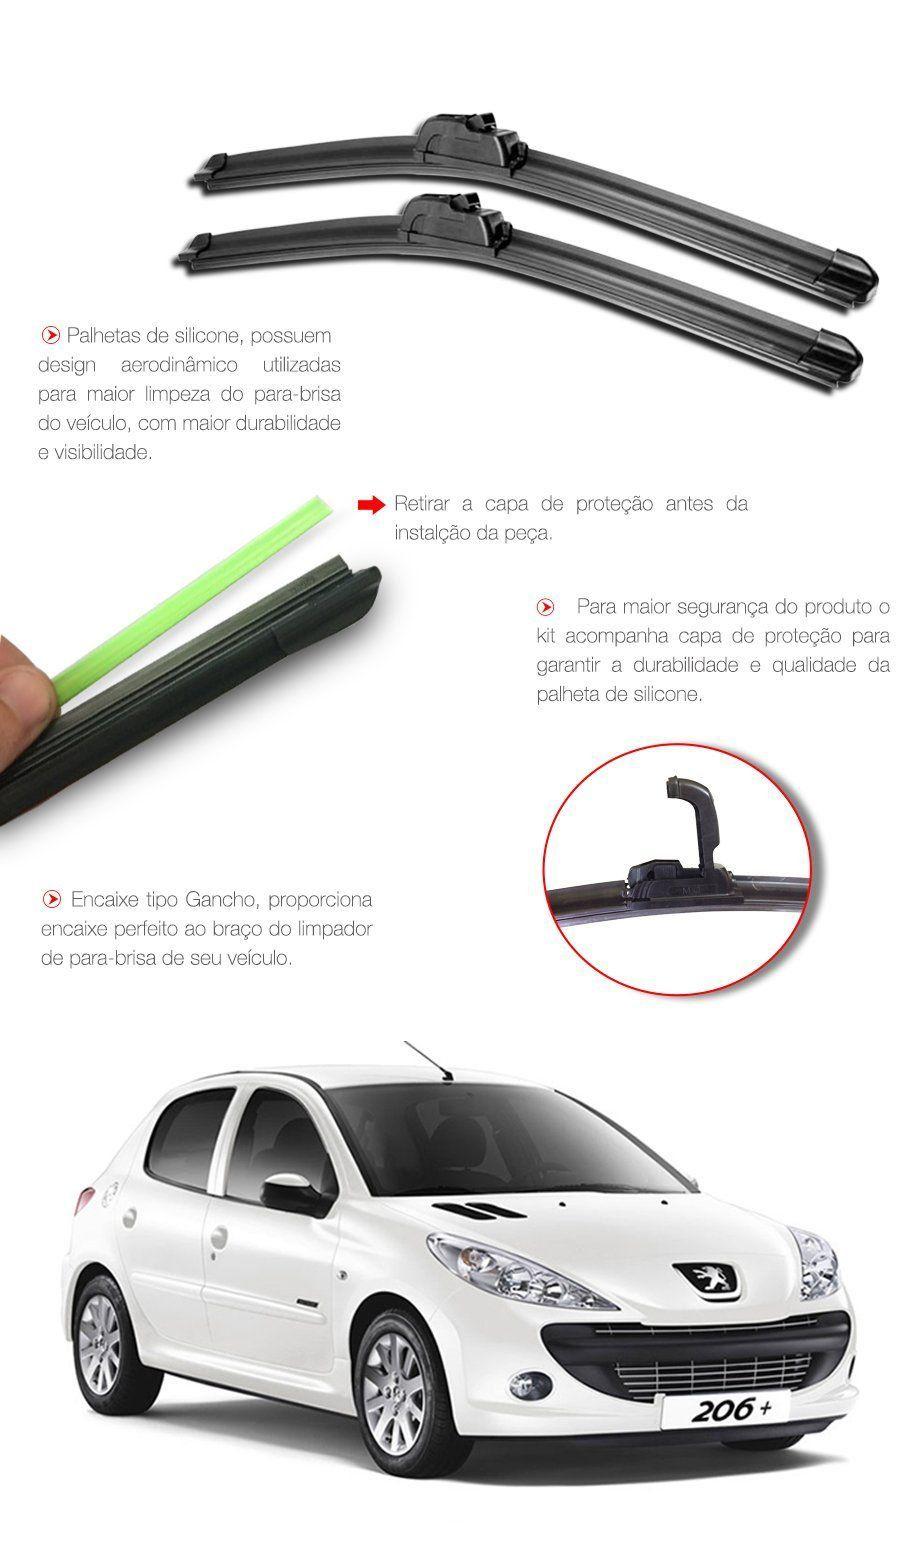 Palheta Limpador Parabrisa Peugeot 206 - 1998 1999 2000 2001 2002 2003 2004 2005 2006 2007 2008